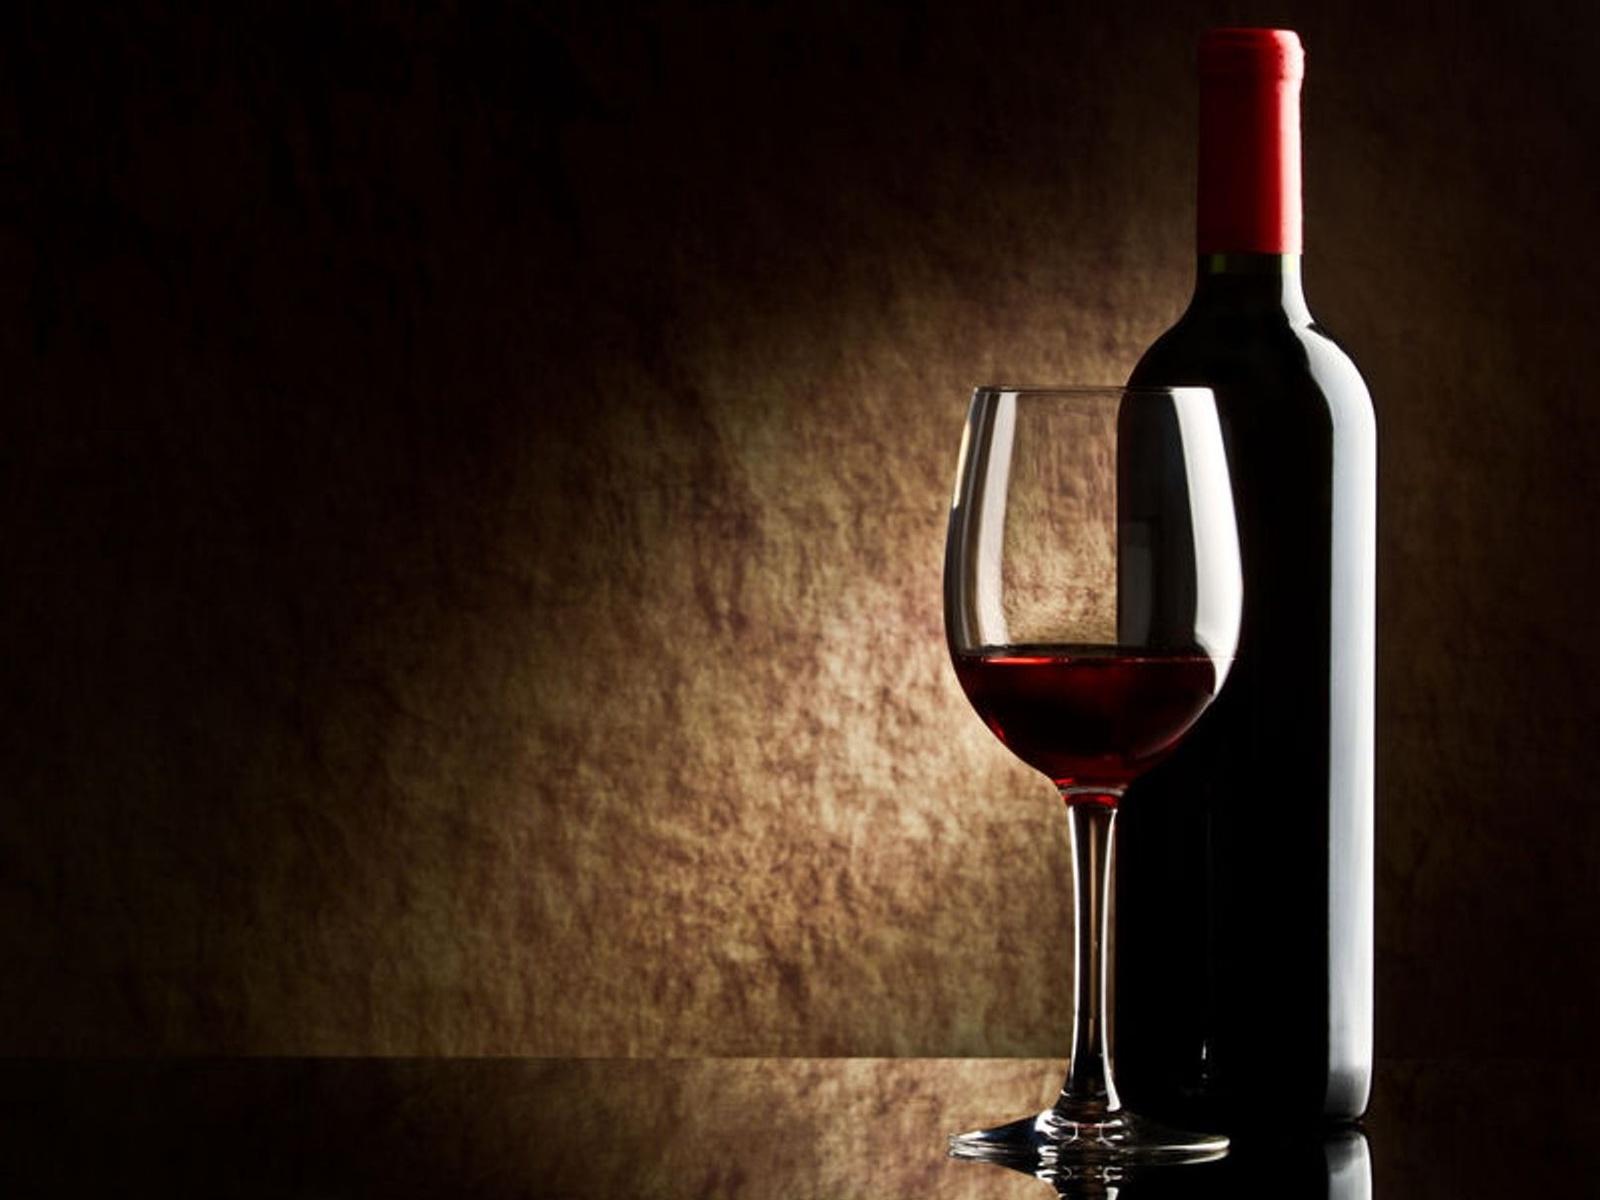 43] Red Wine Desktop Wallpapers on WallpaperSafari 1600x1200